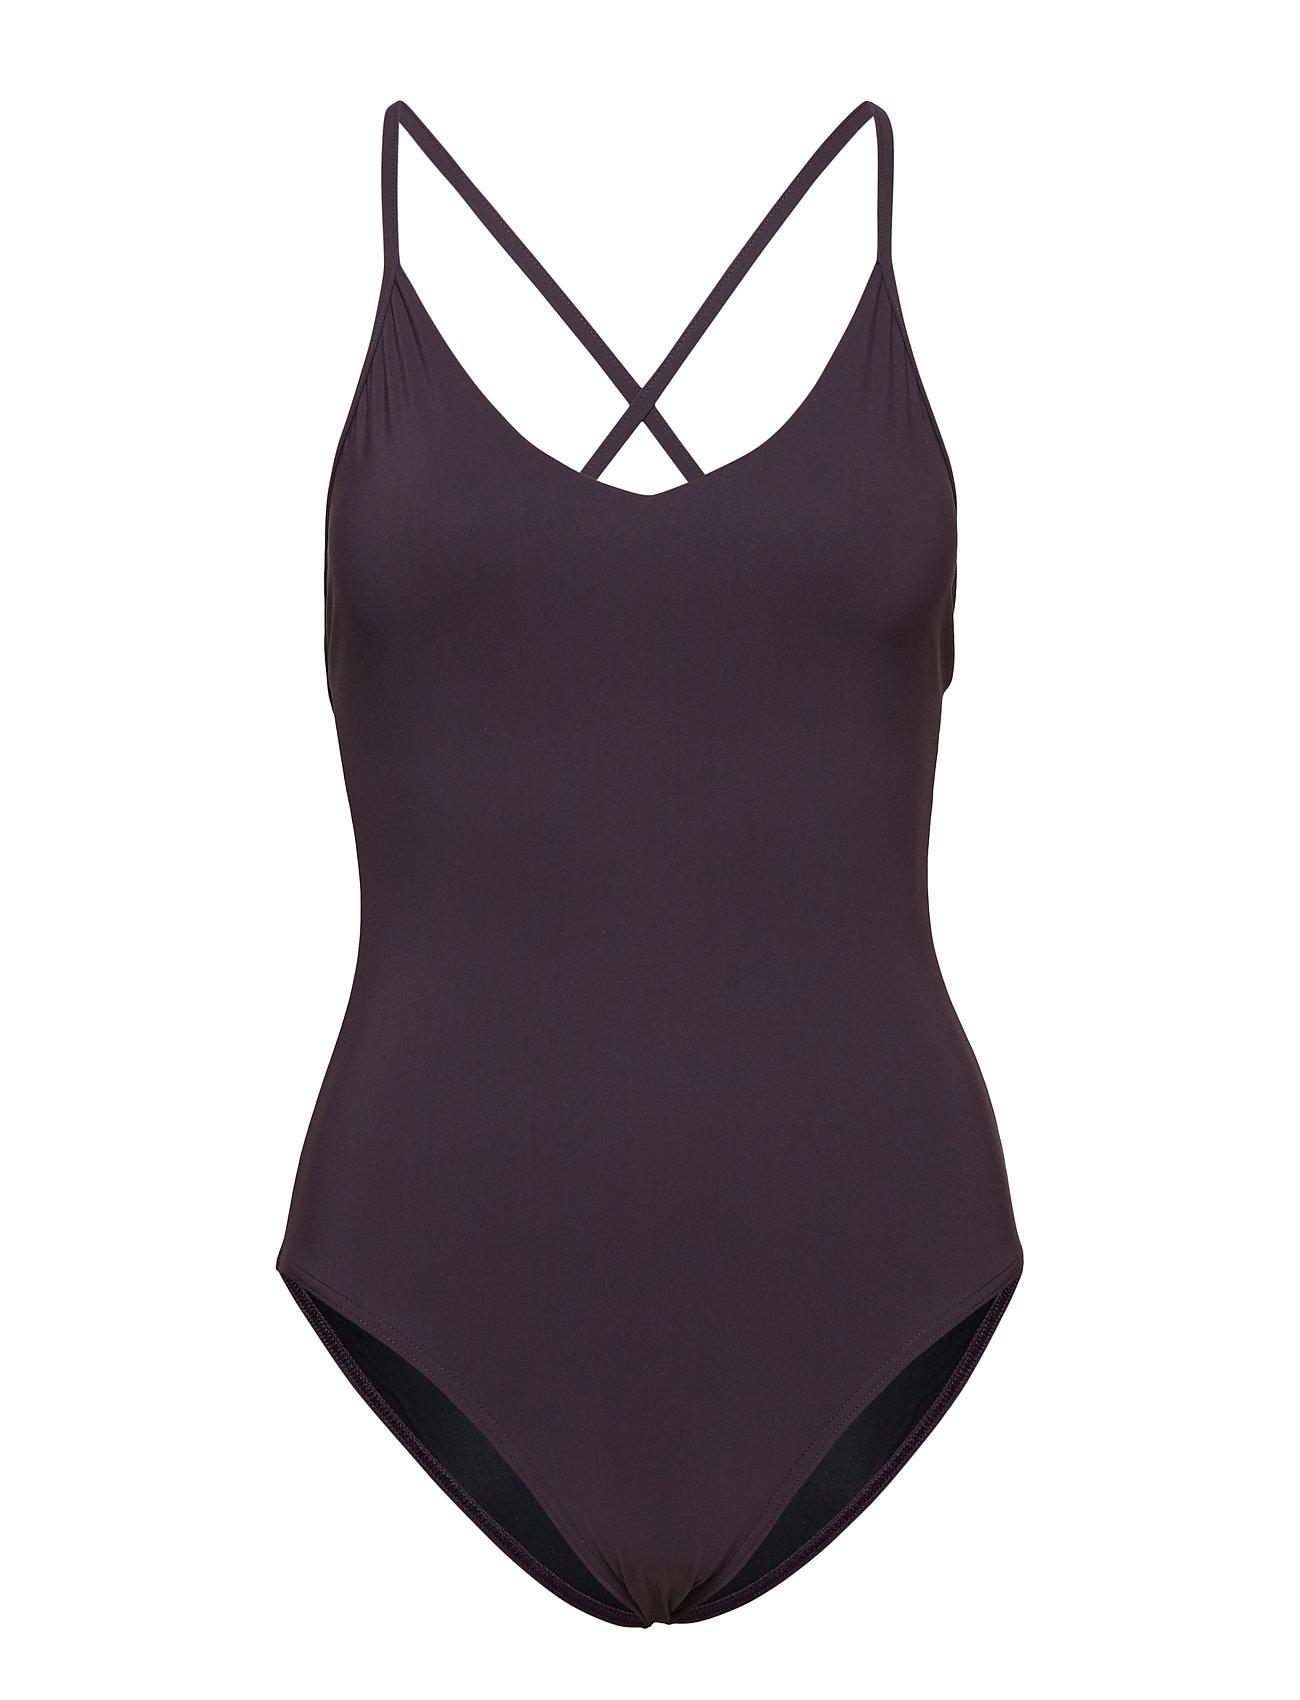 Filippa K Soft Sport Cross-back Swimsuit